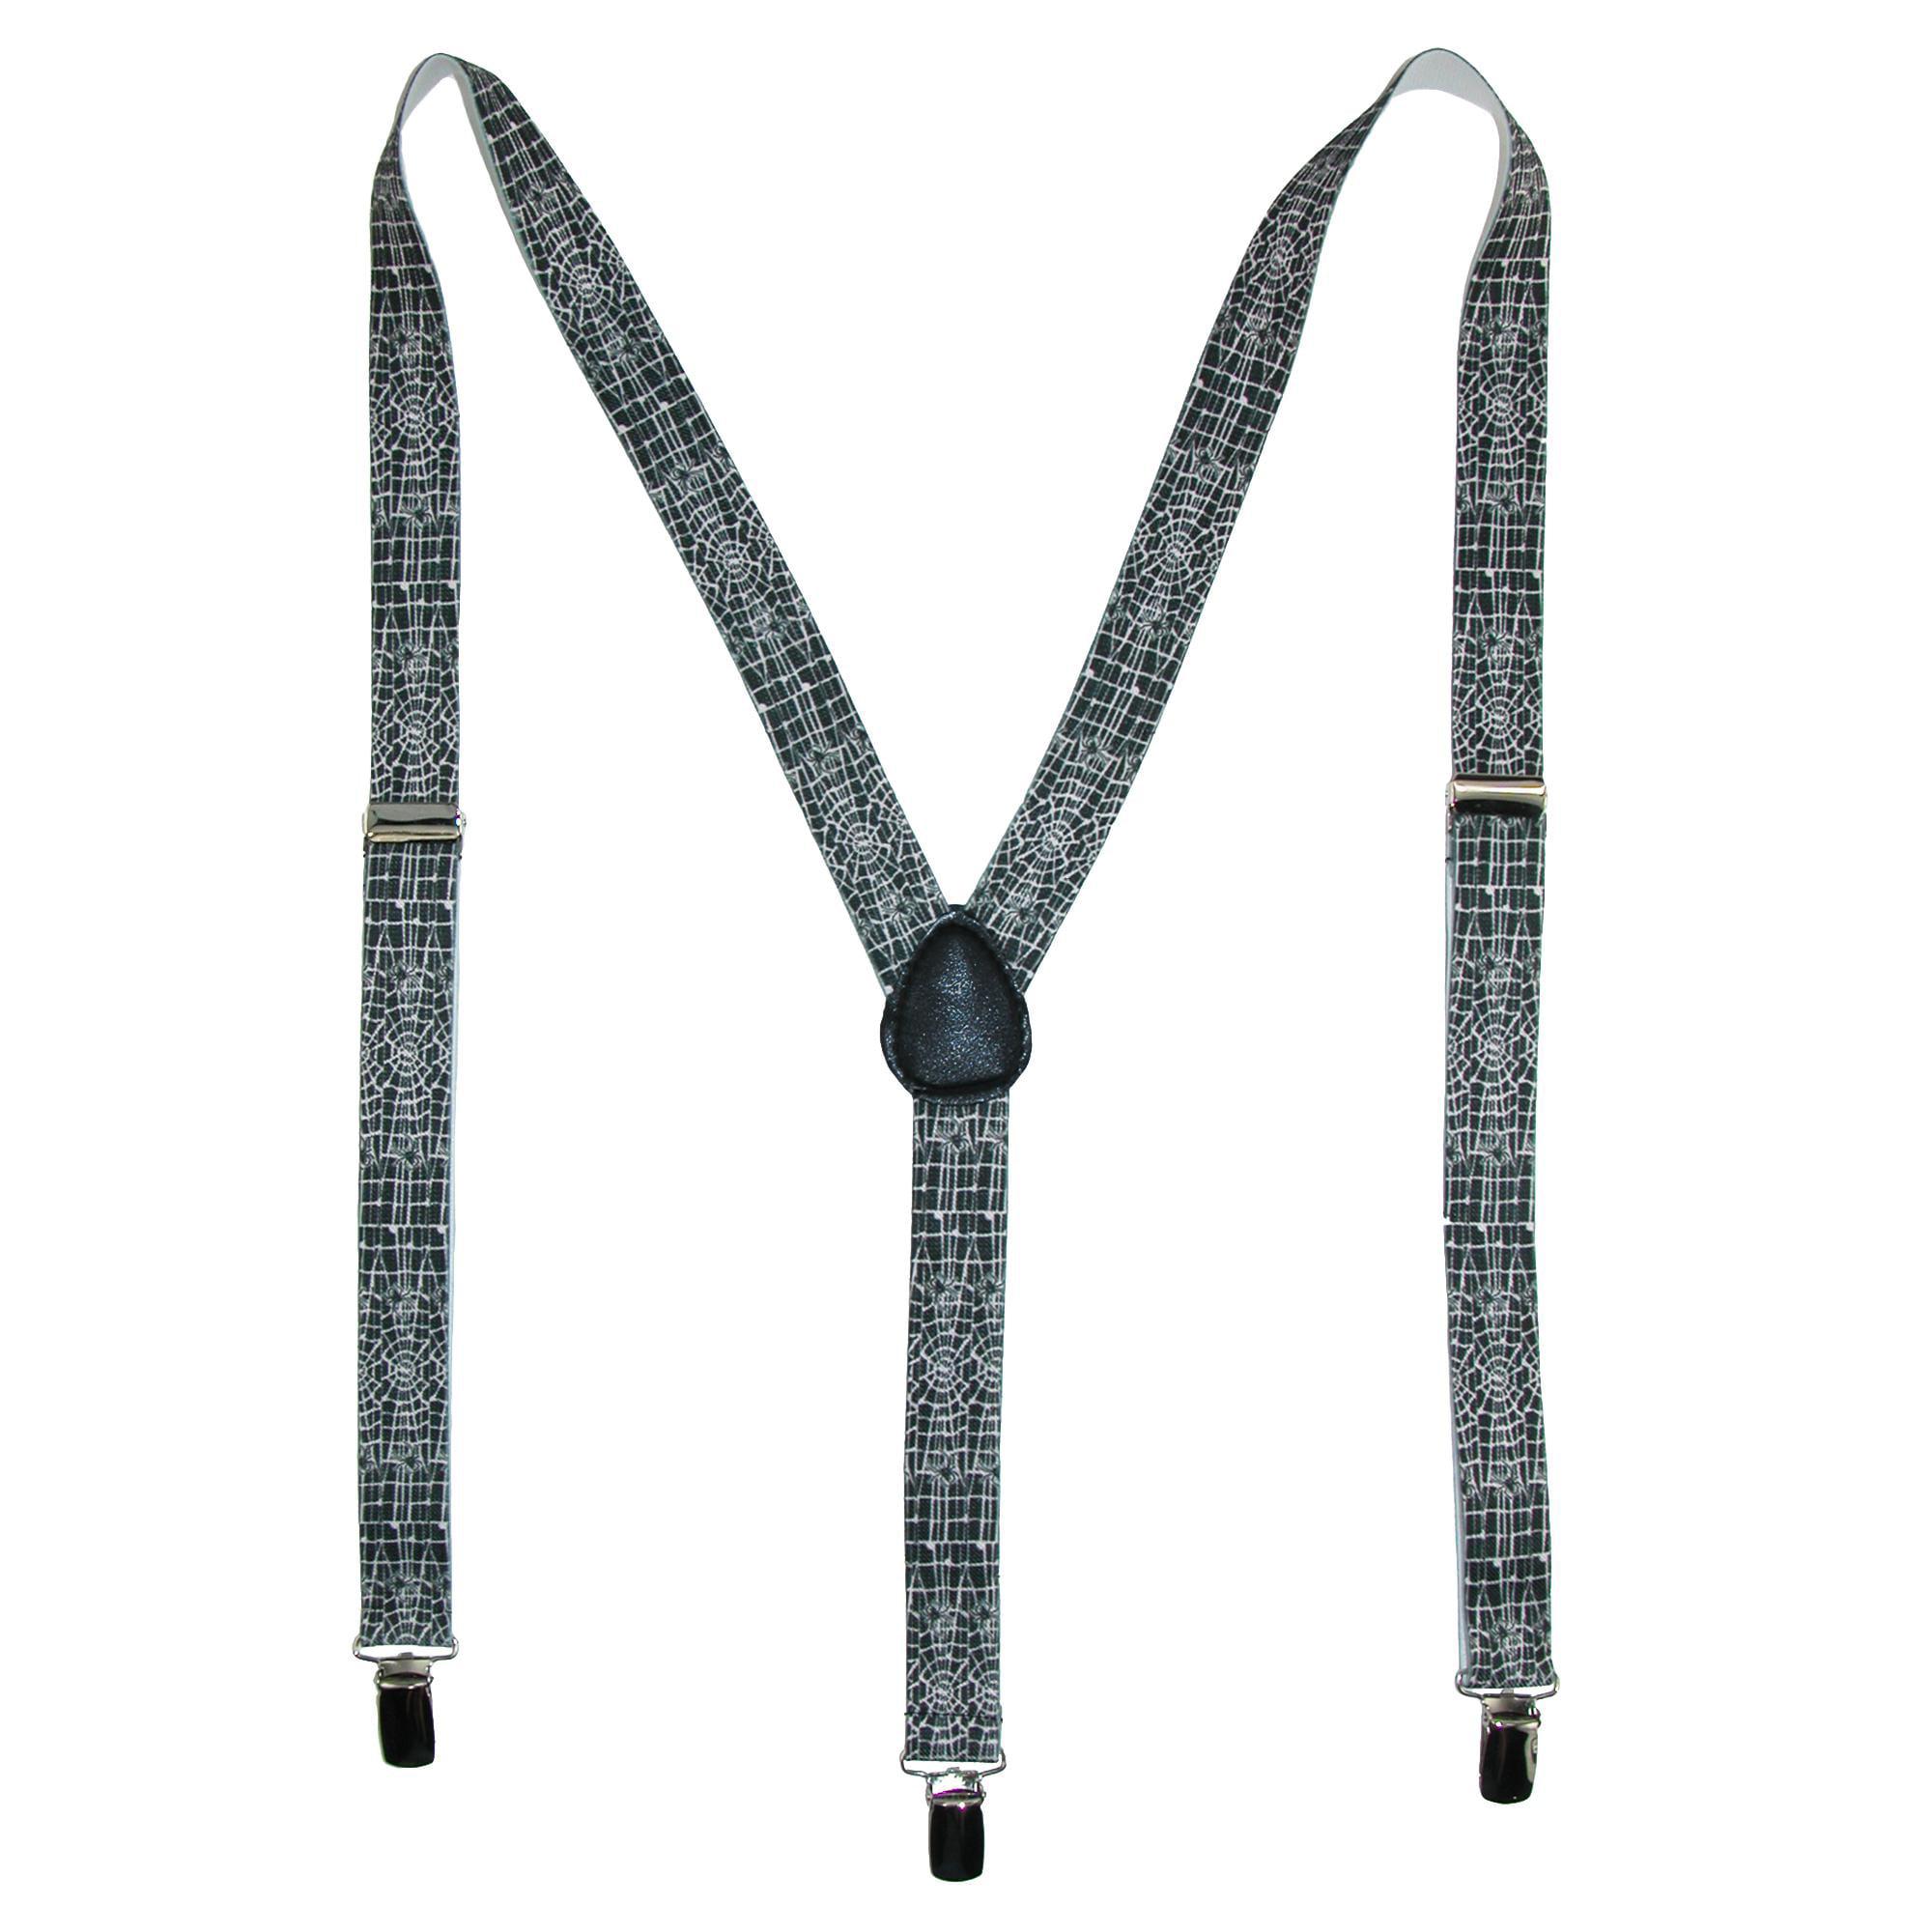 Parquet Elastic Novelty Spider Web Print Suspenders - image 3 of 3